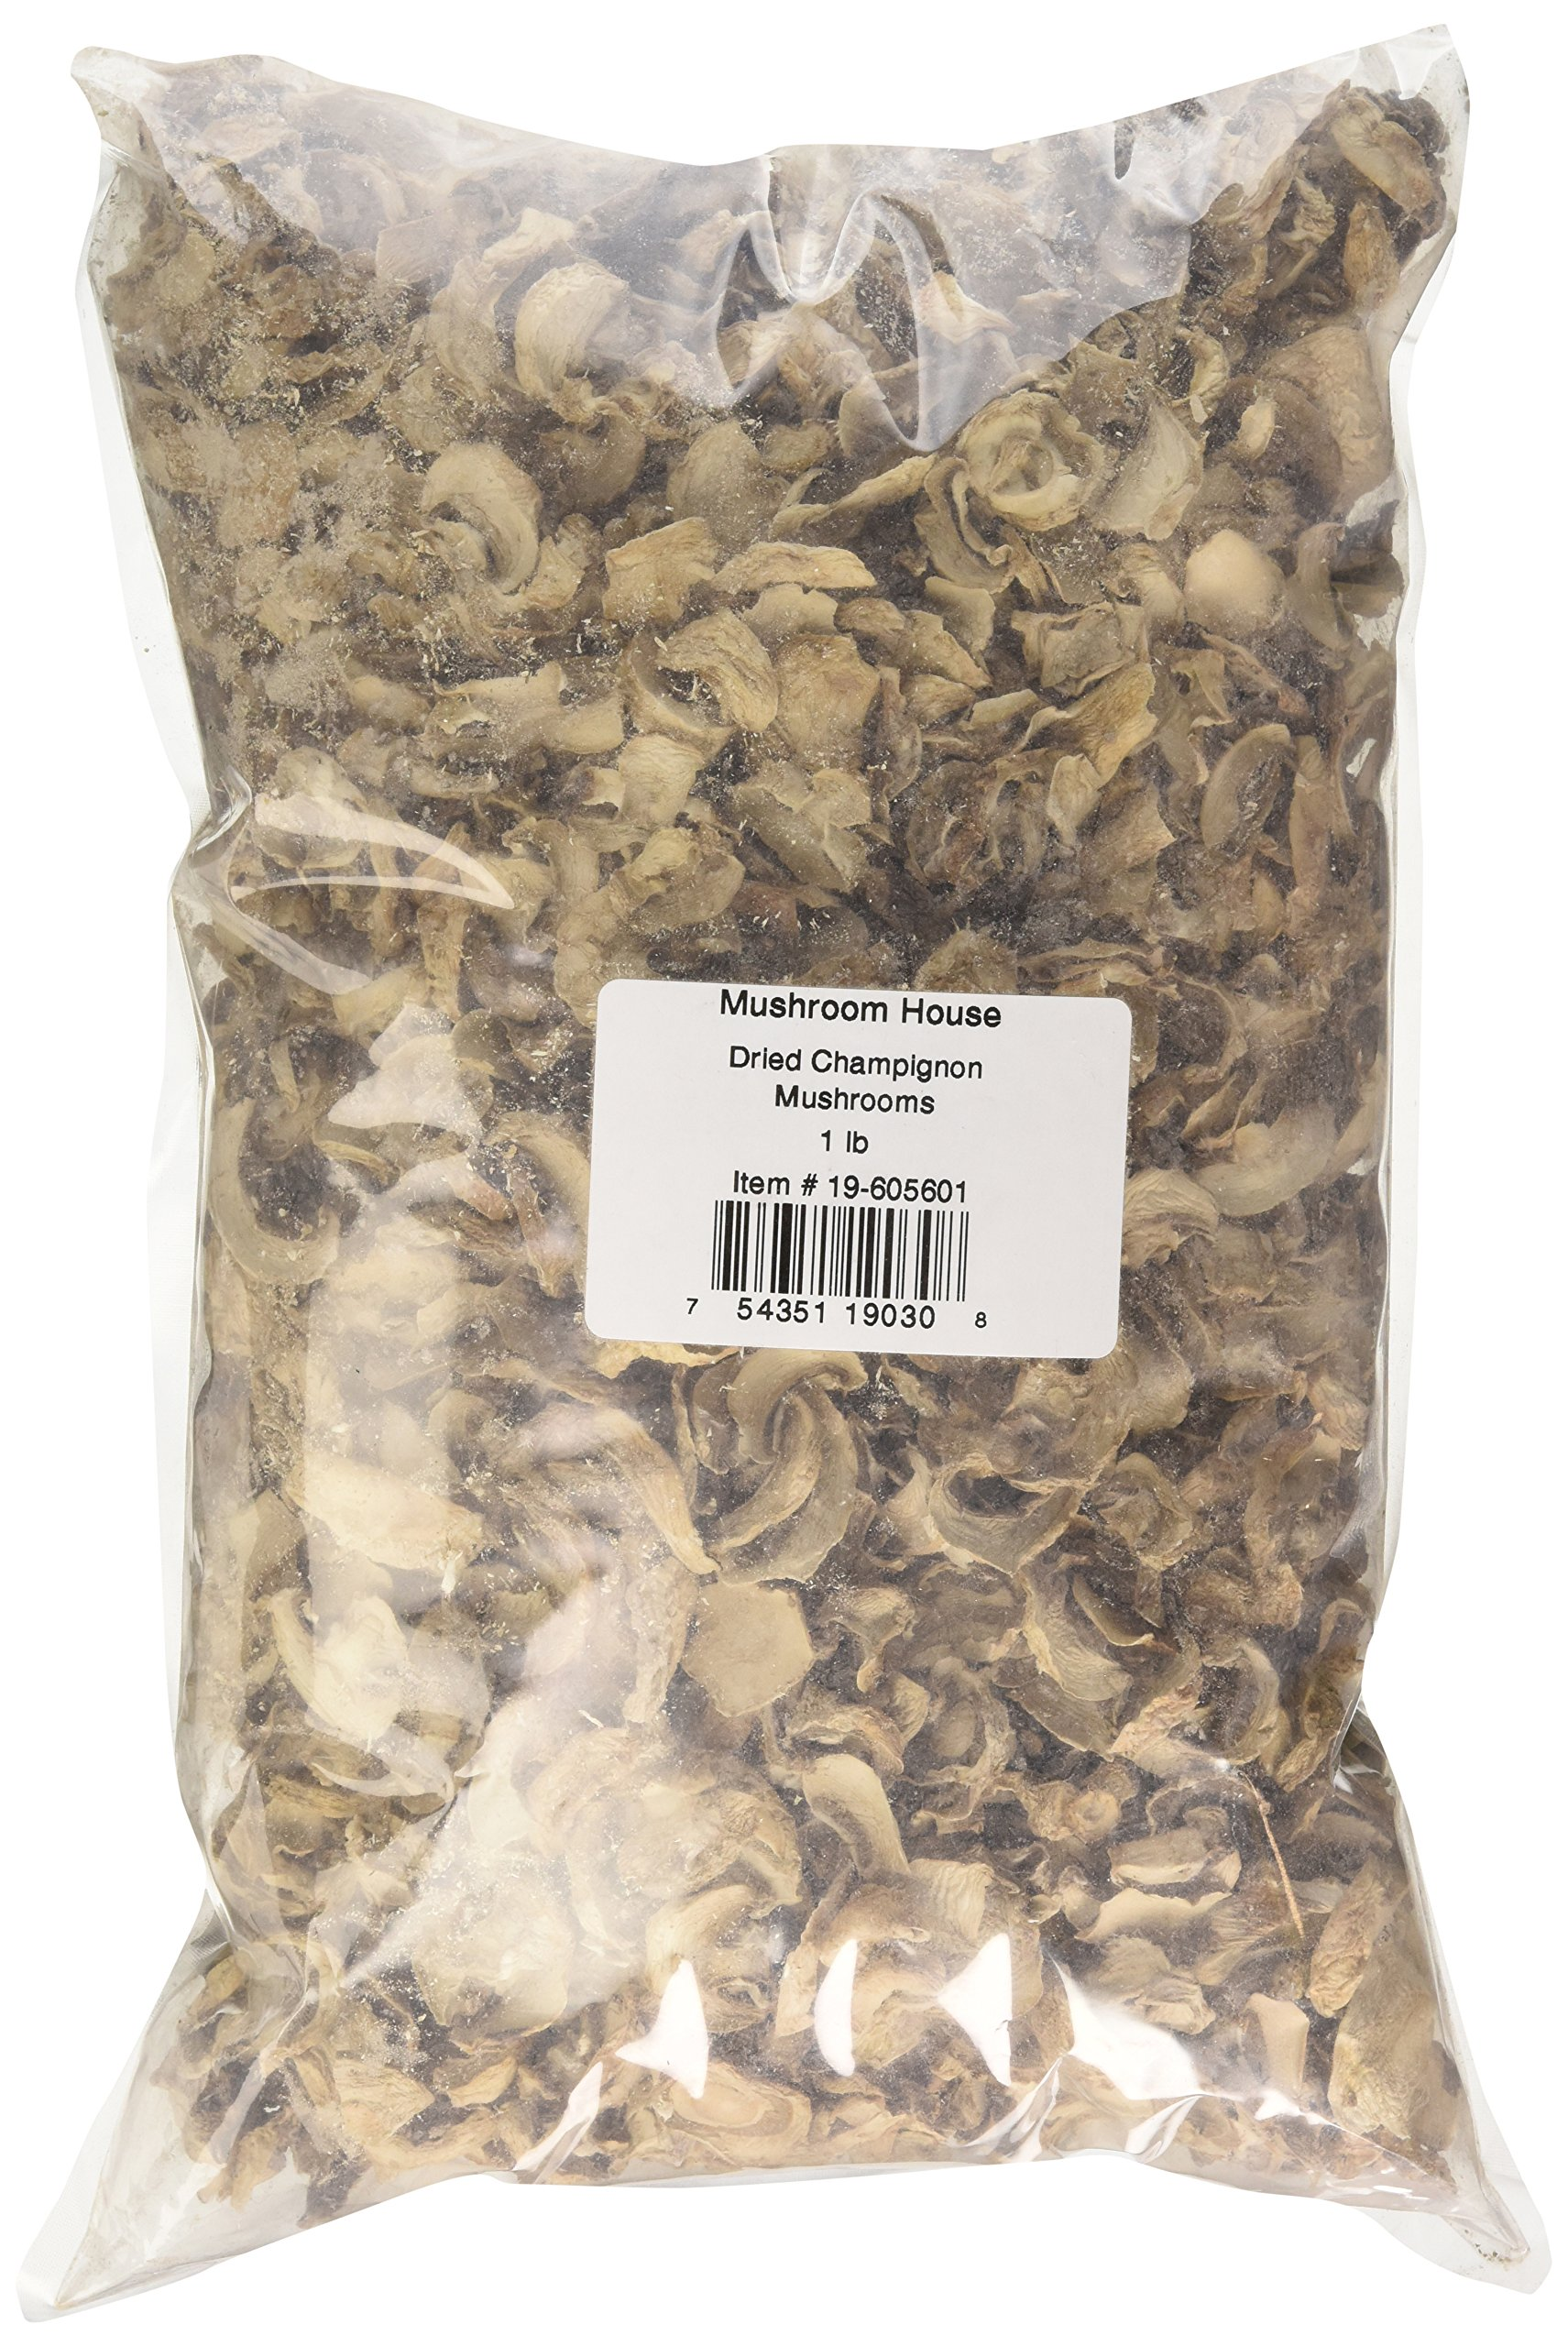 Mushroom House Dried Champignon Mushrooms, 1 Pound by Mushroom House